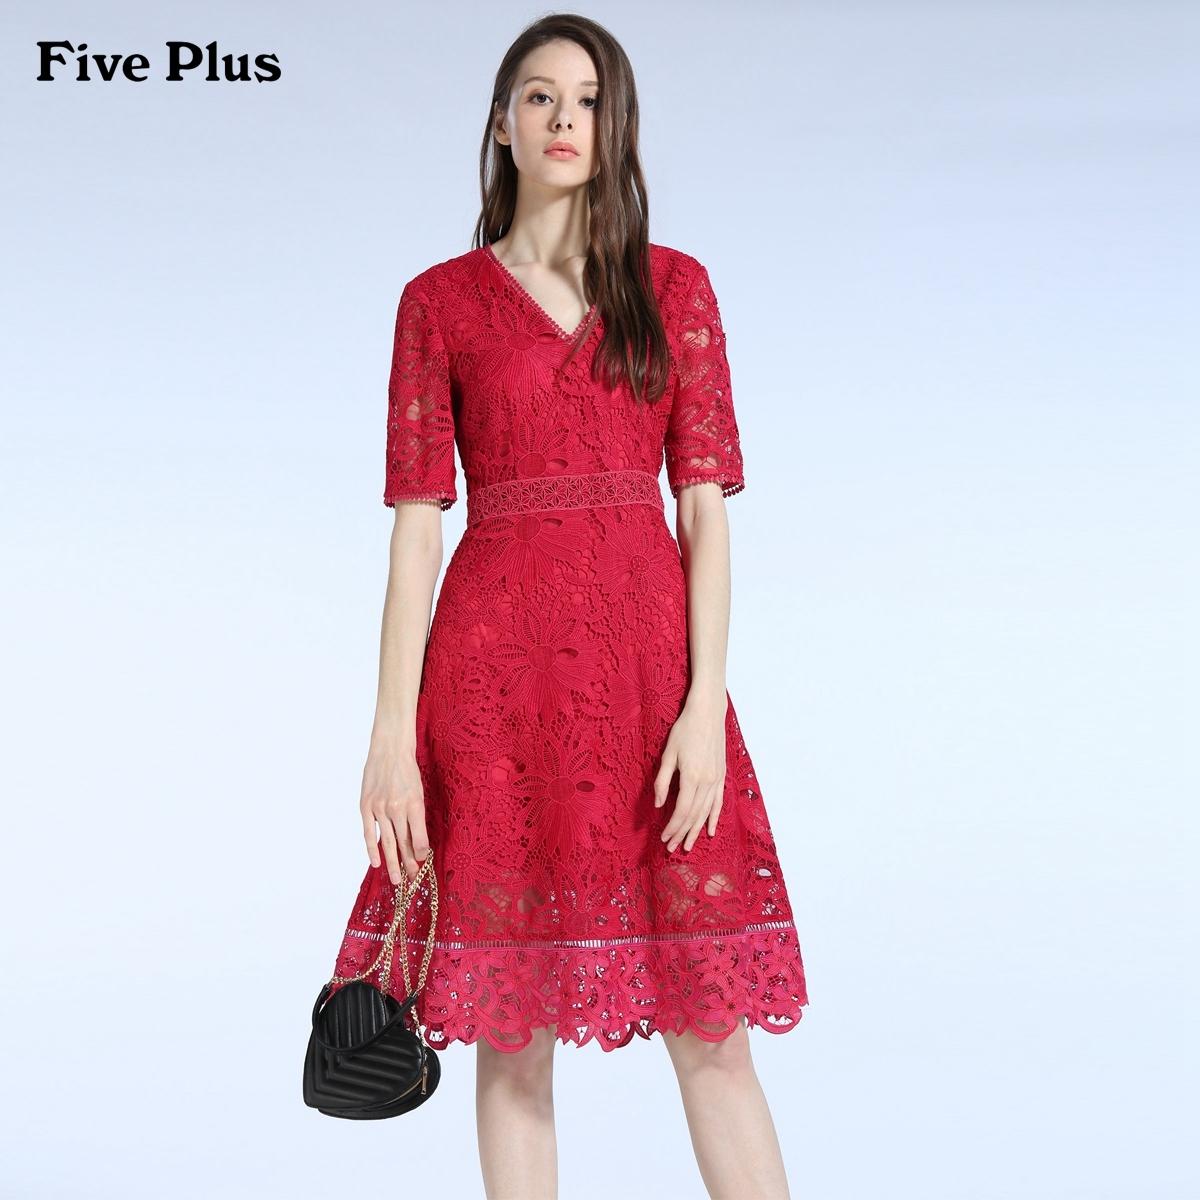 Five Plus新女夏装气质镂空刺绣花边高腰V领短袖连衣裙2JM2082230